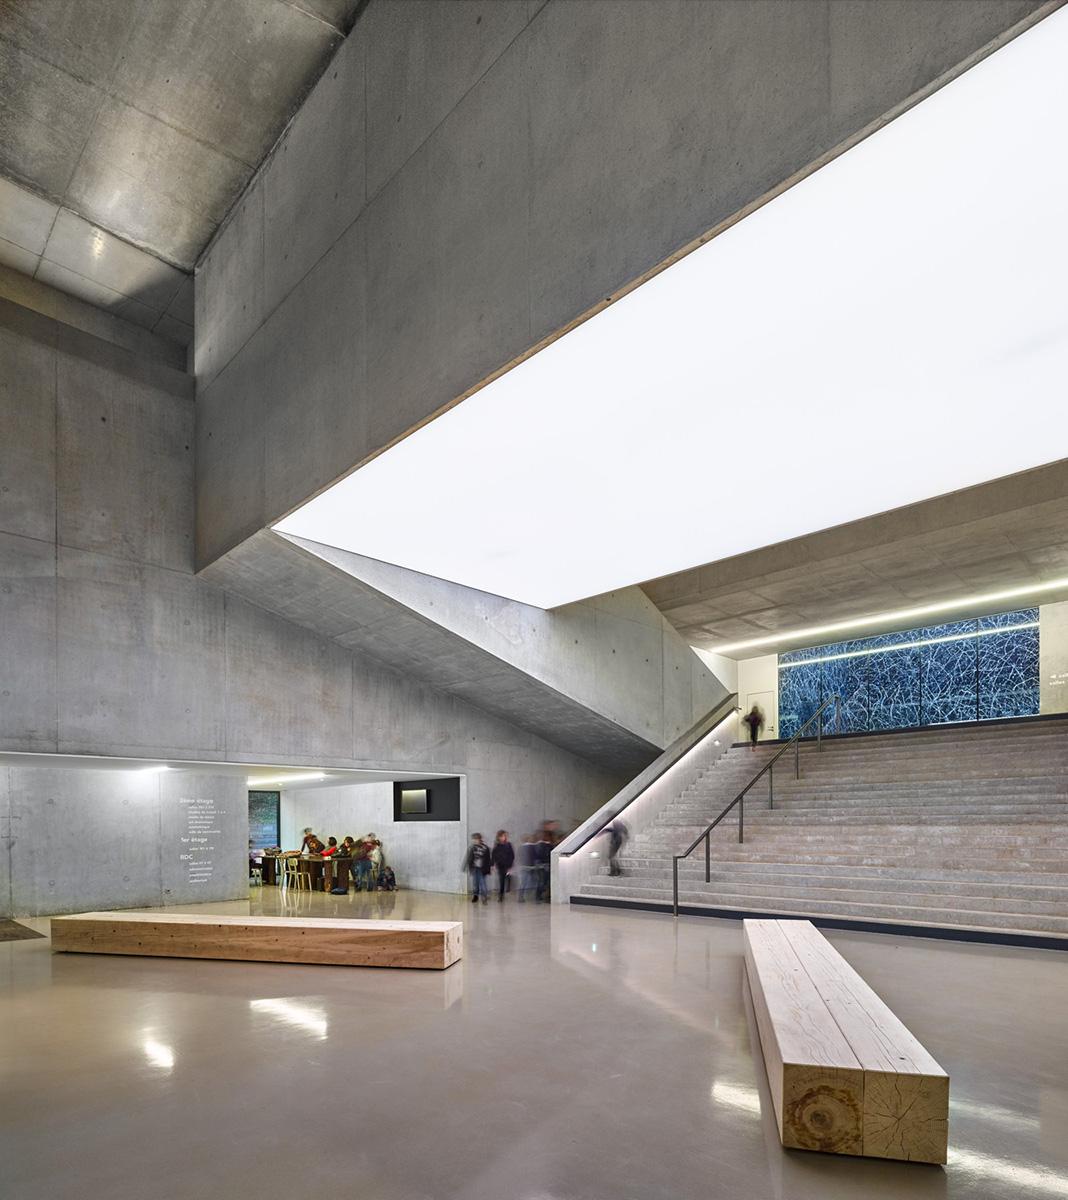 07-conservatorio-musica-danza-artes-dramaticas-henri-dutilleux-dominique-coulon-architecte